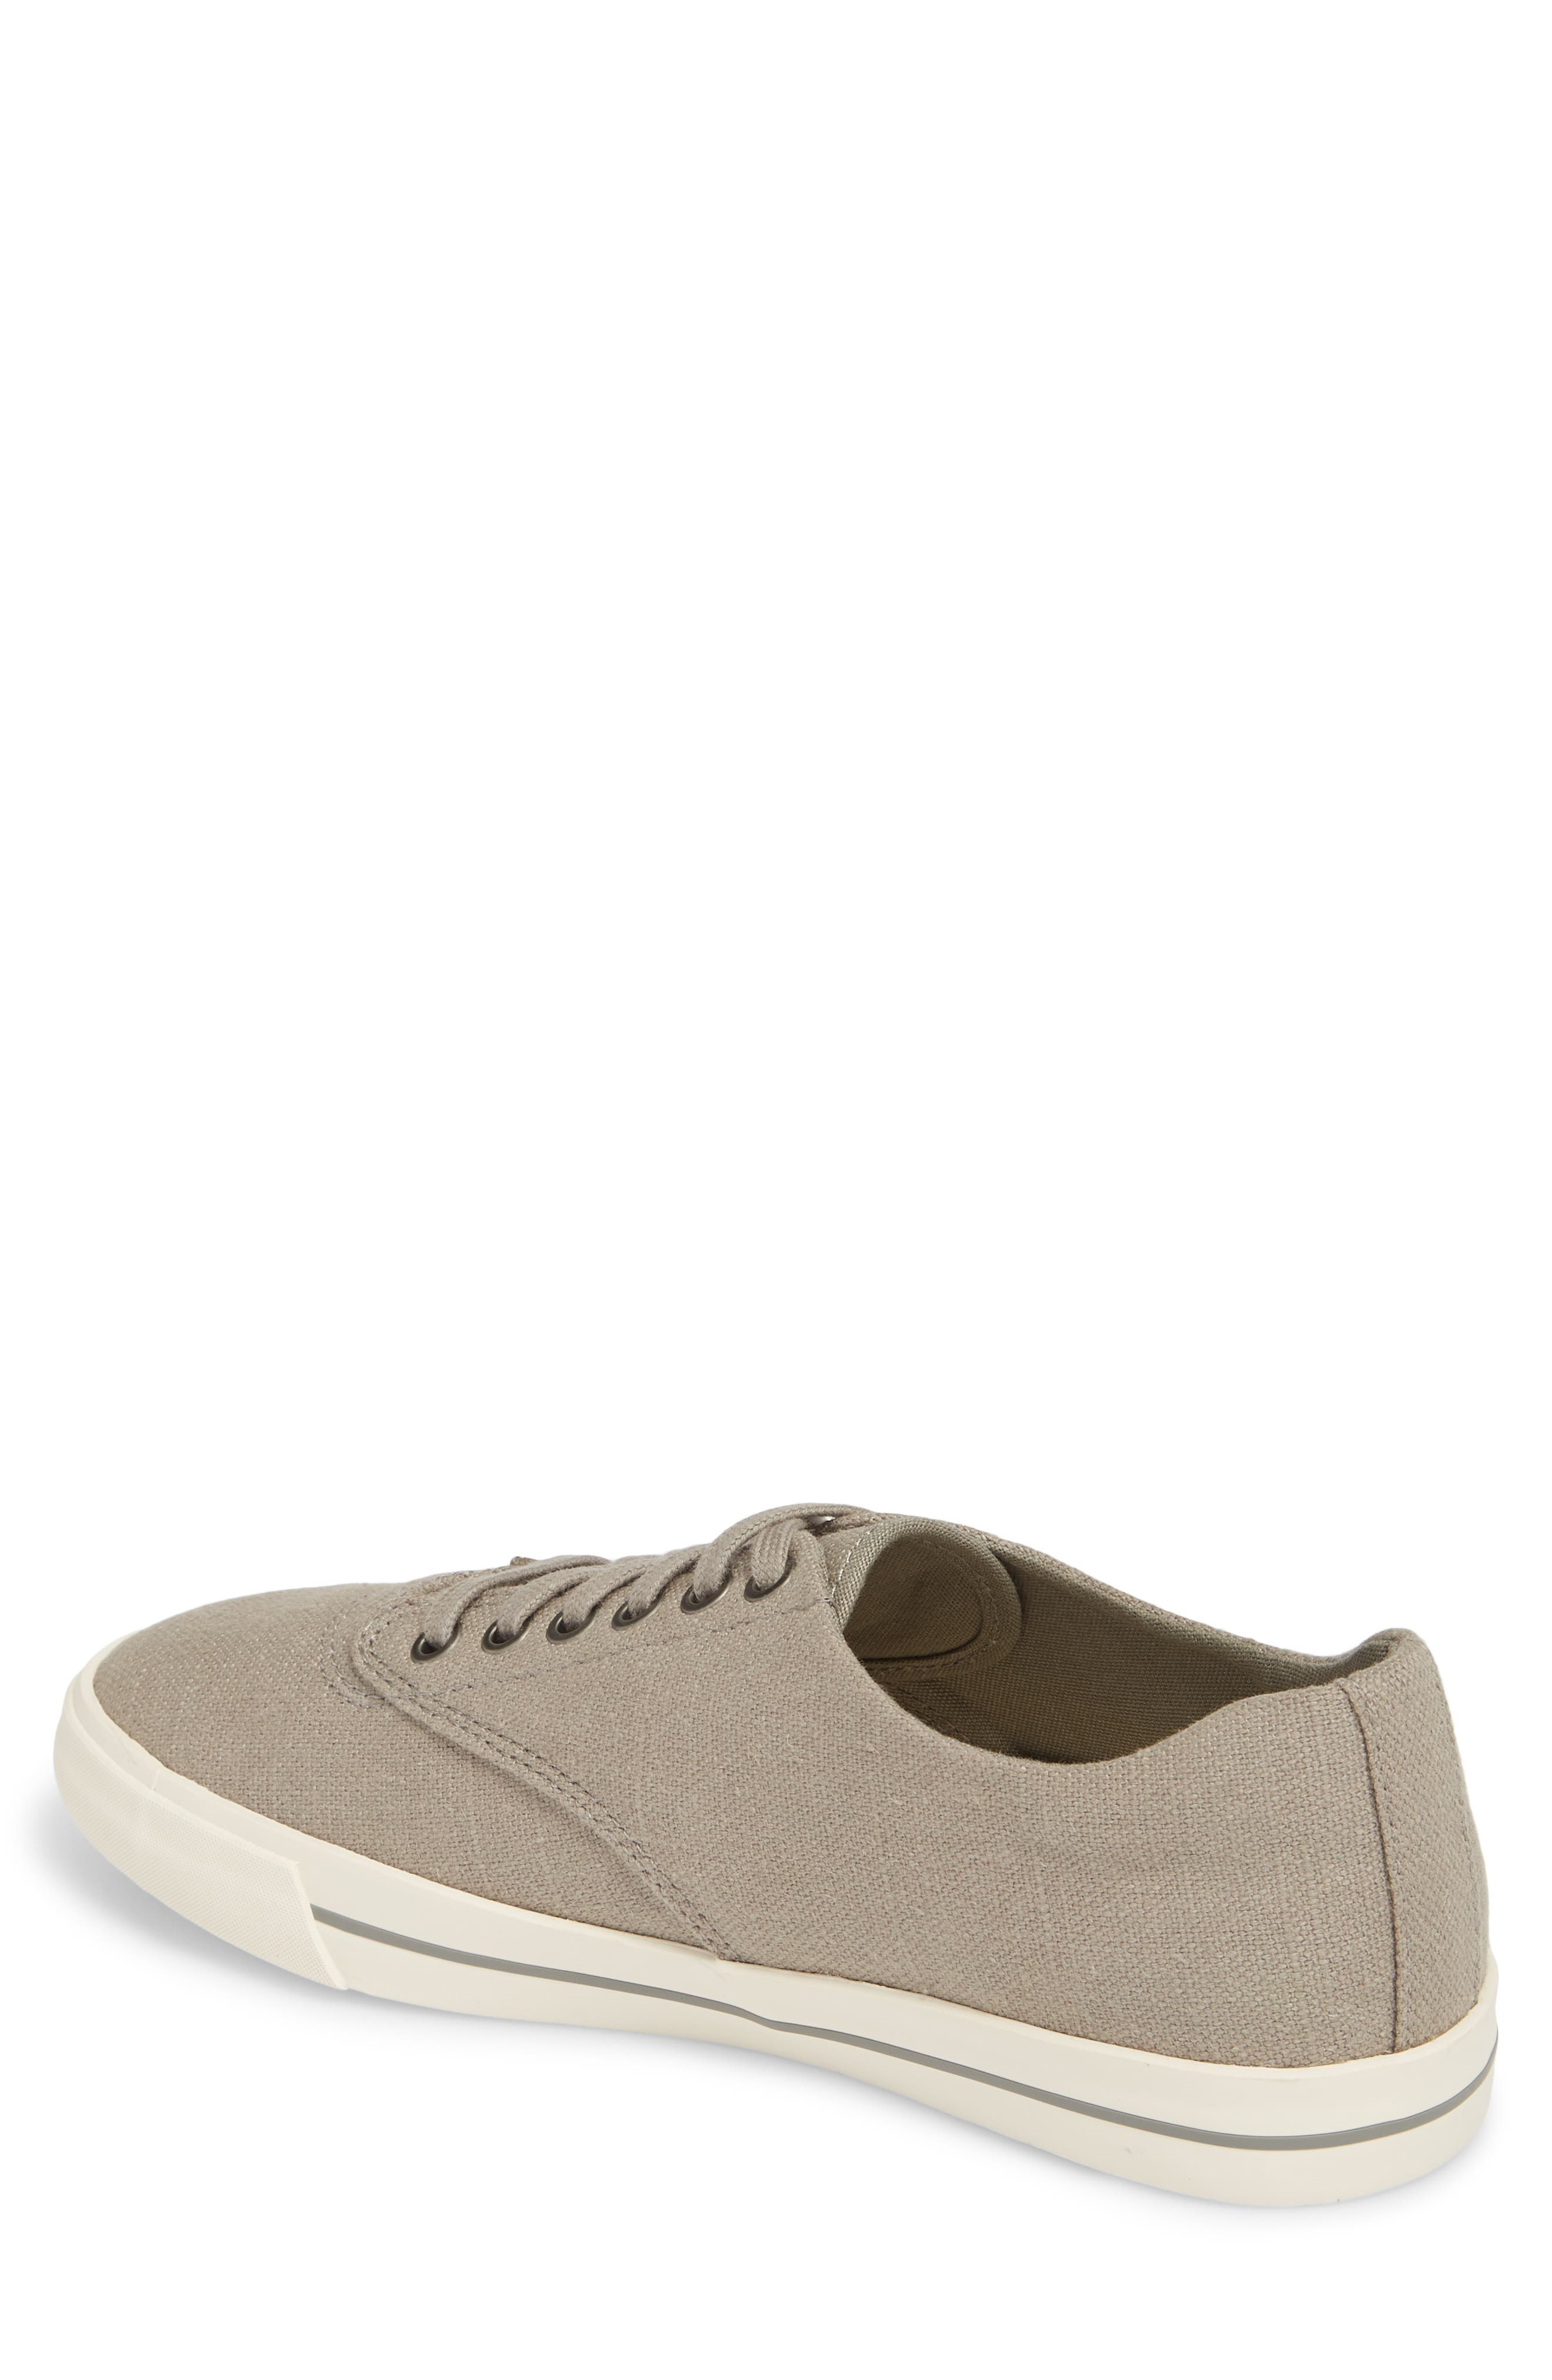 'Hermosa Plimsoll' Sneaker,                             Alternate thumbnail 2, color,                             TIN GREY VINTAGE WASH LINEN